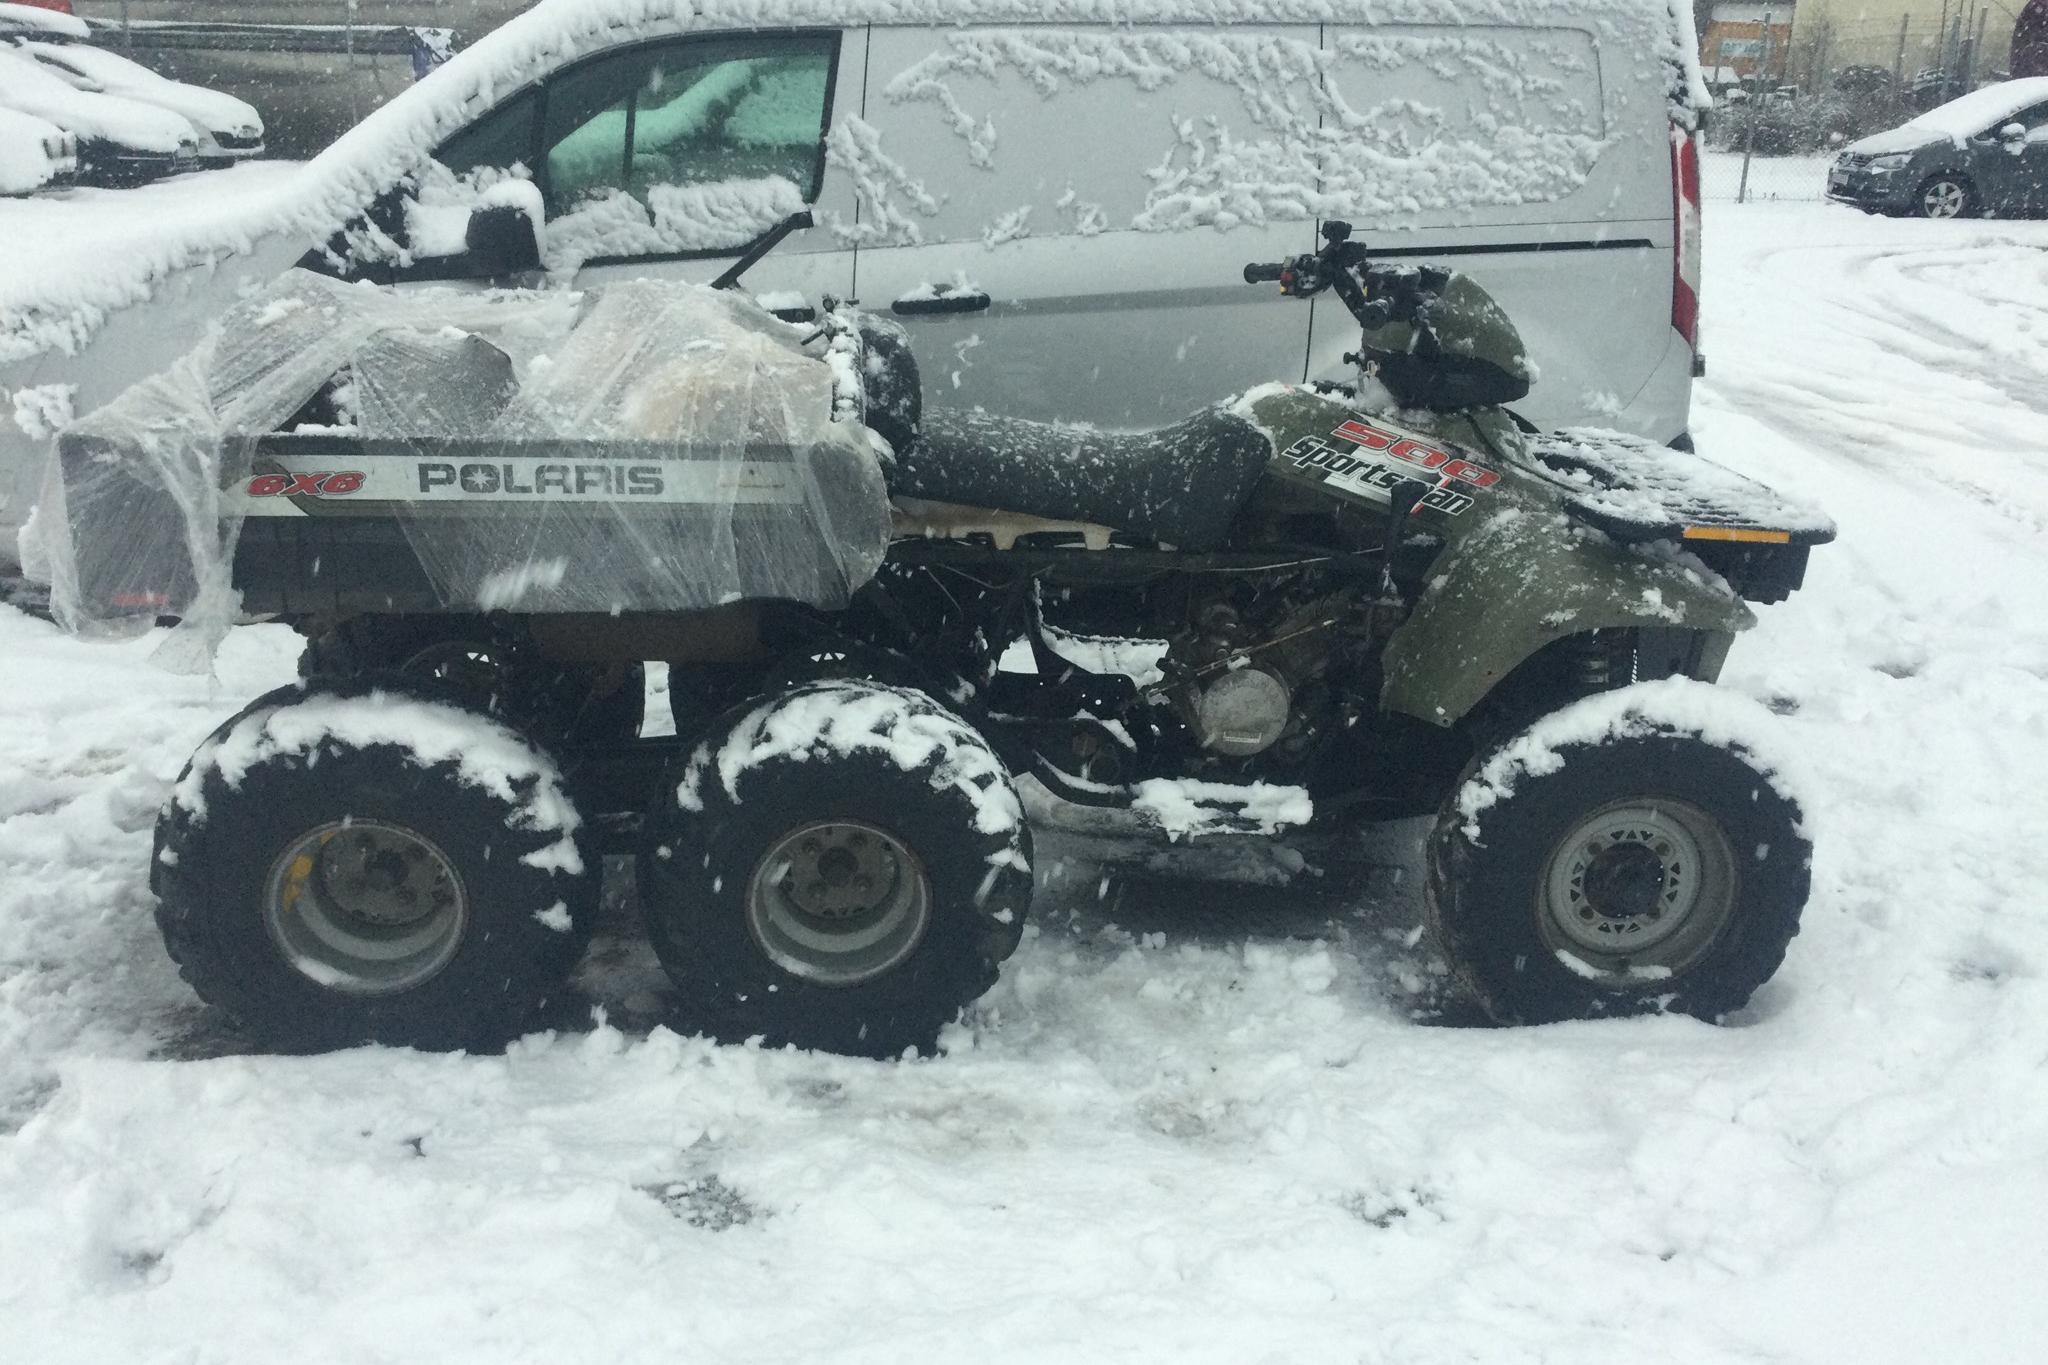 POLARIS Sportsman 500 6X6 ATV Reservdelsenhet - 0 km - Automatic - green - 2003